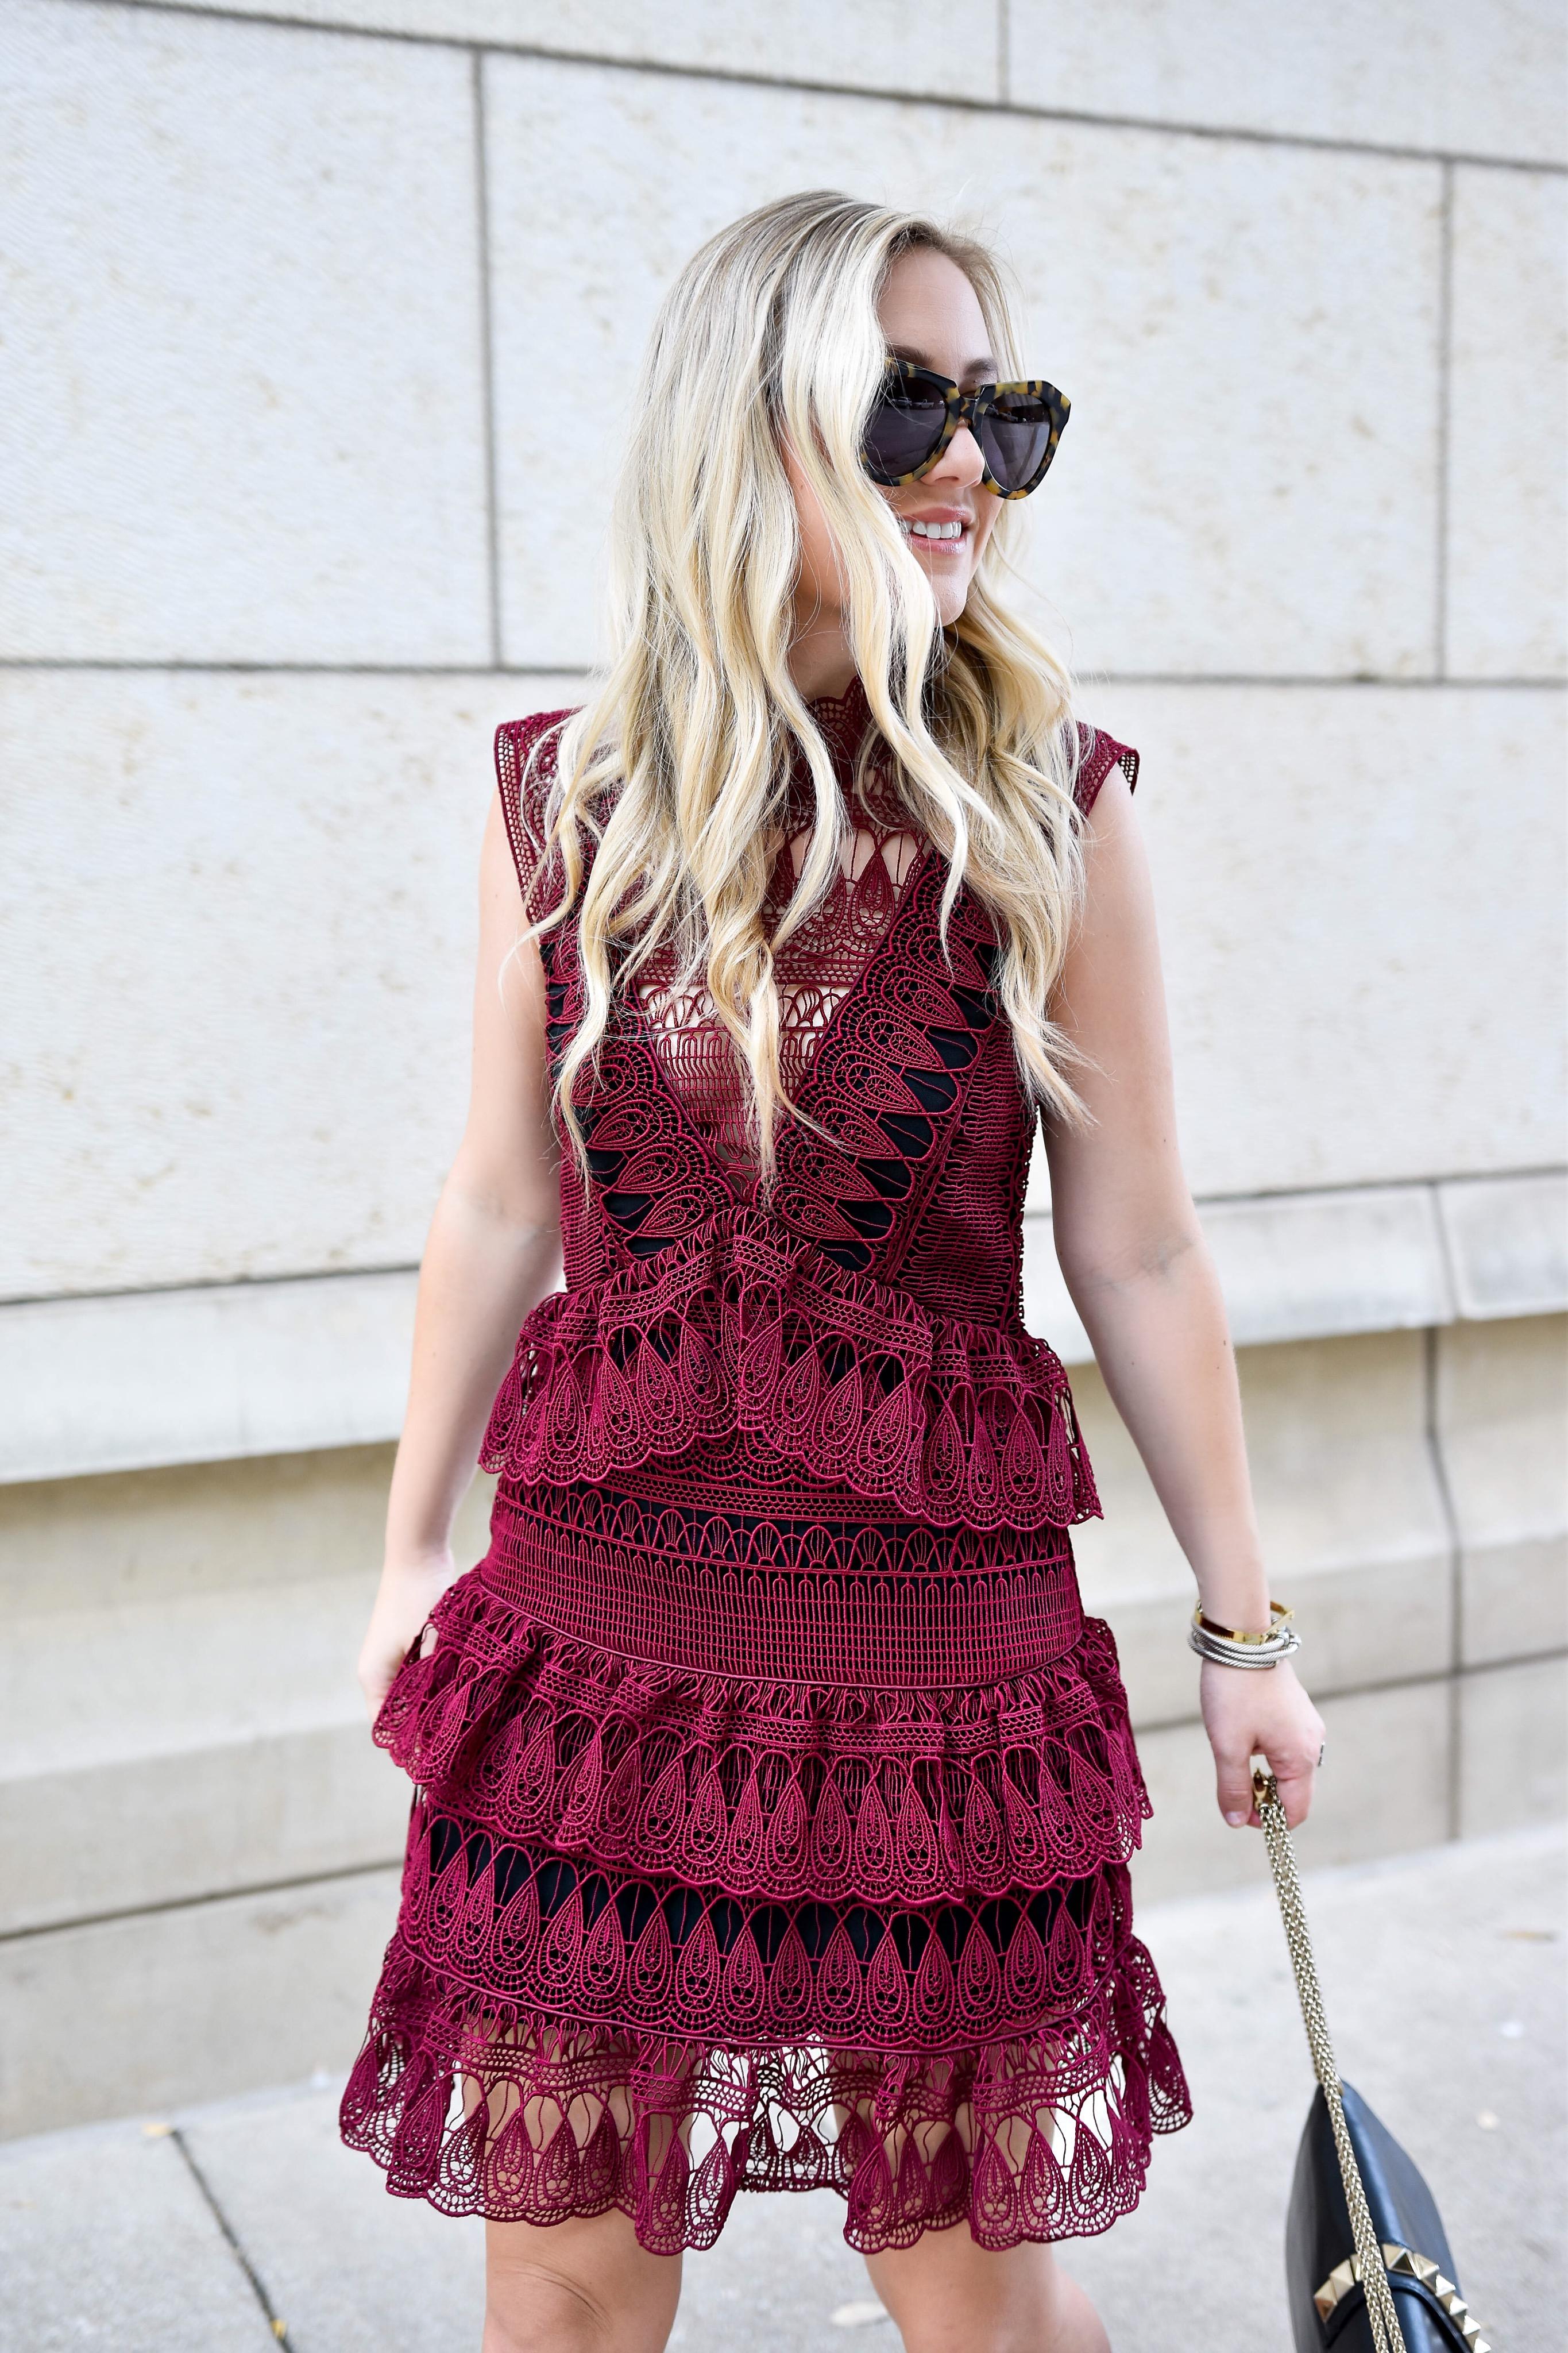 Self-Portrait-Sleeveless-Lace-Mini-Dress, Self-Portrait-Neiman-Marcus, Neiman-Marcus-Sale, Valentino-handbag